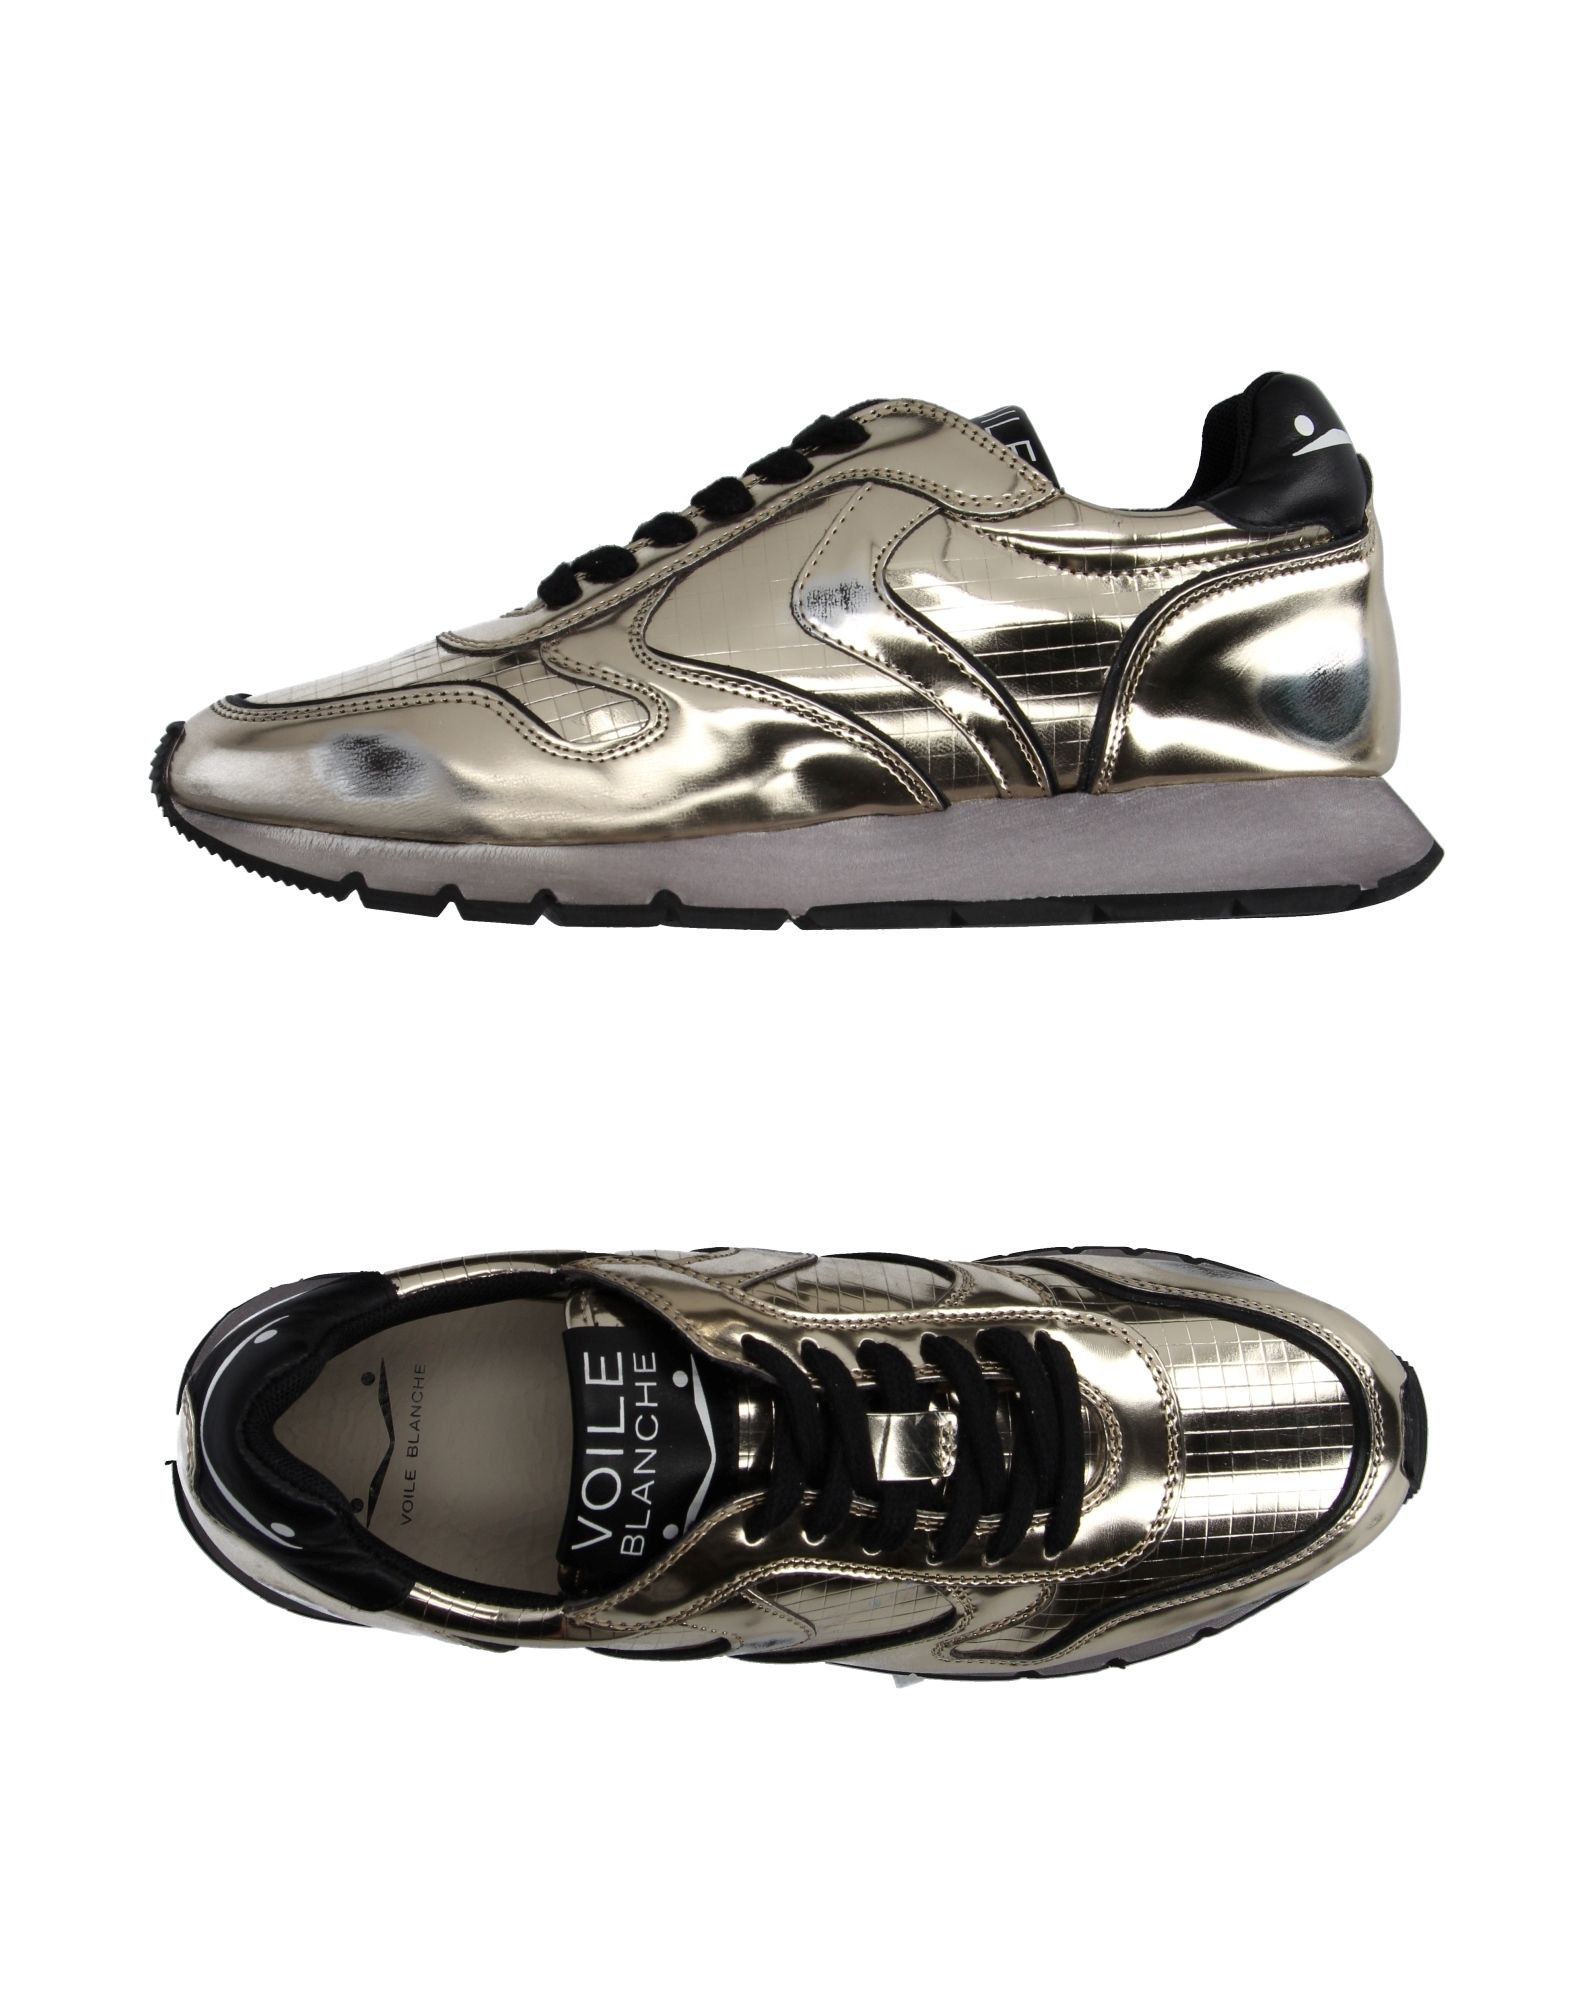 Voile 11027798JL Blanche Sneakers Damen  11027798JL Voile Neue Schuhe 082f40